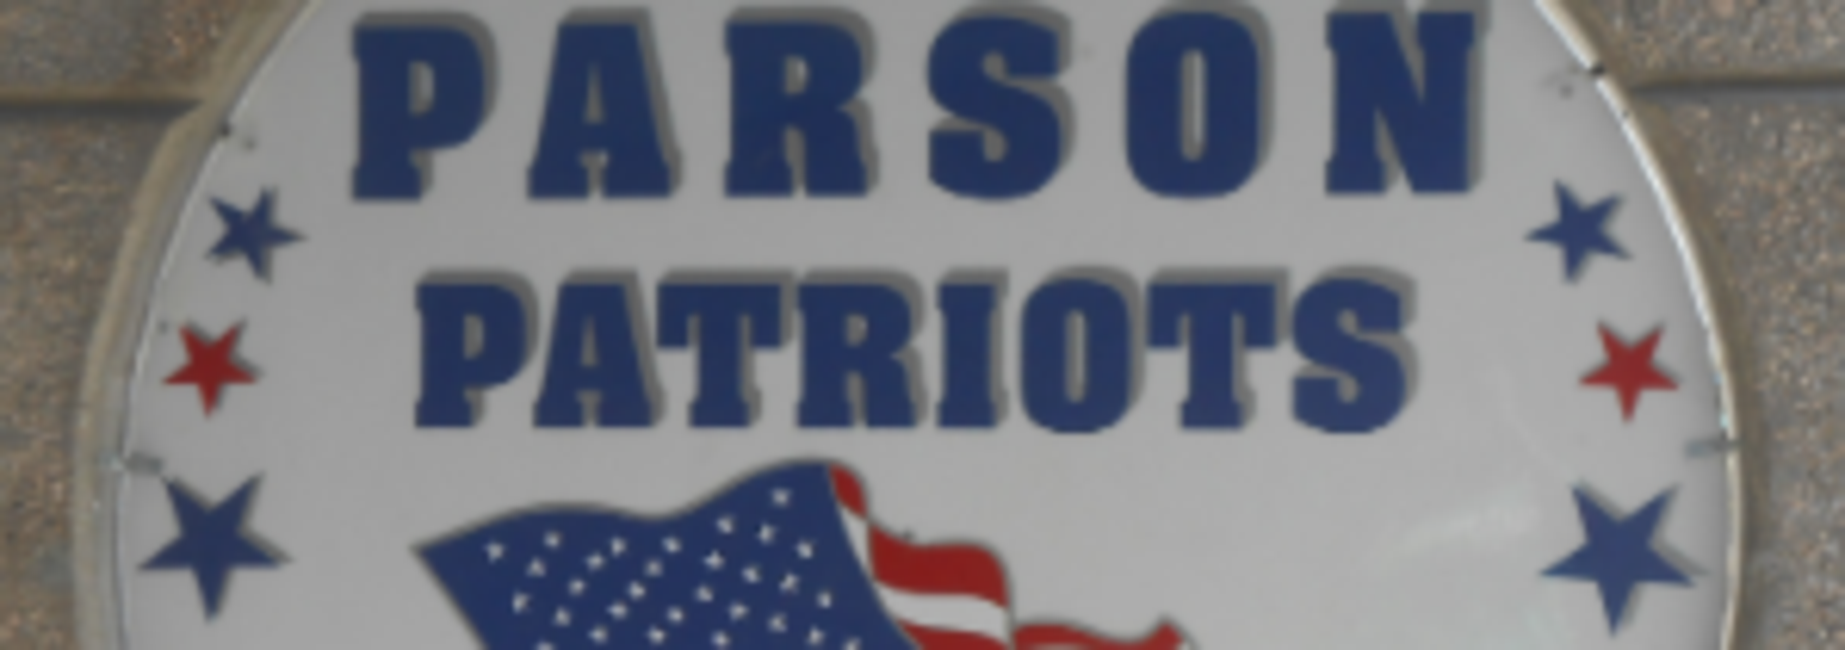 Parson Patriots